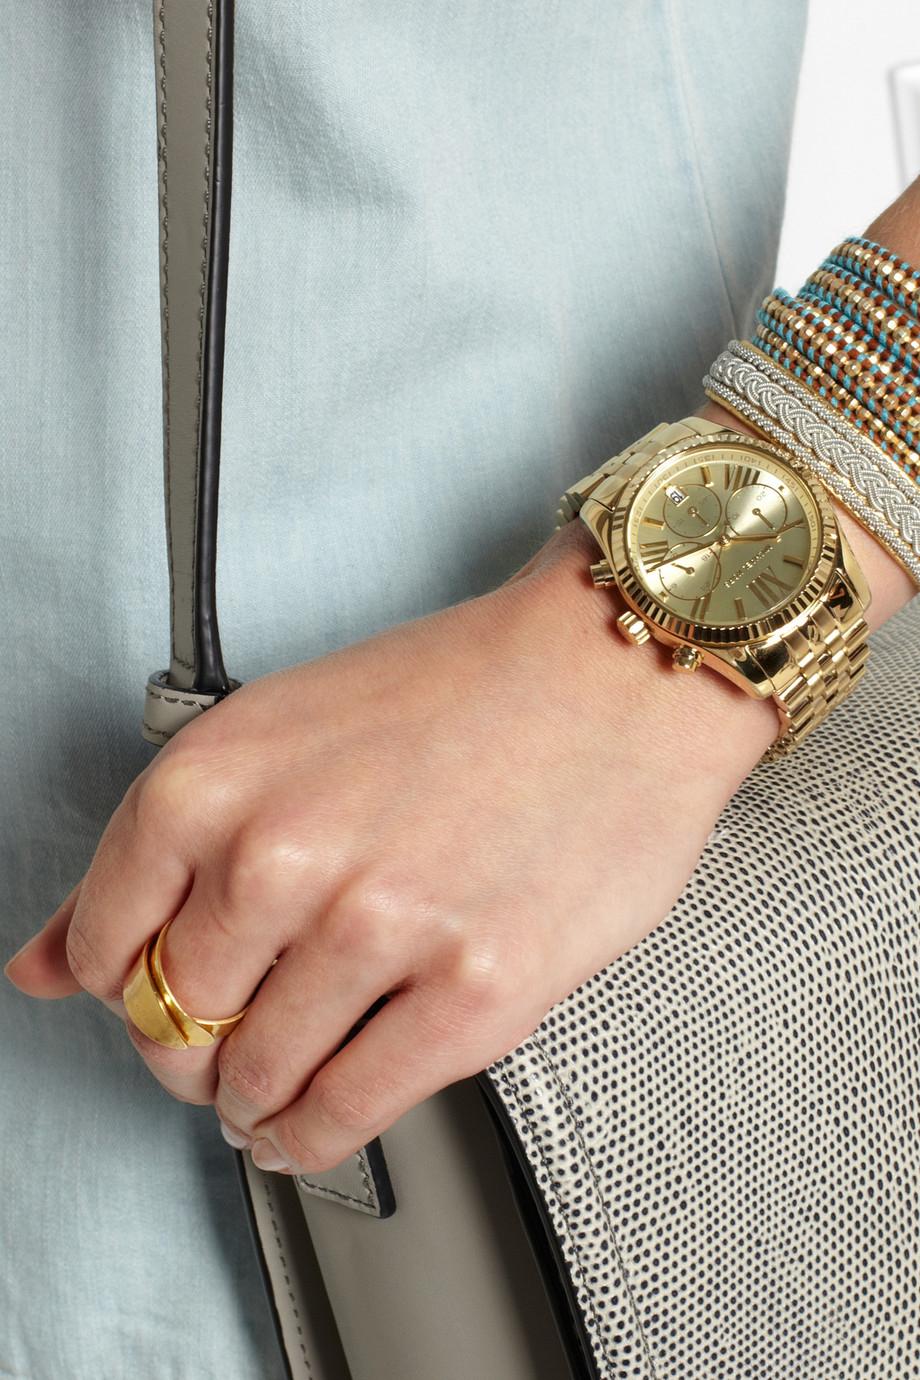 83f24445d97e9 Lyst - Michael Kors Lexington Gold-Tone Watch in Metallic